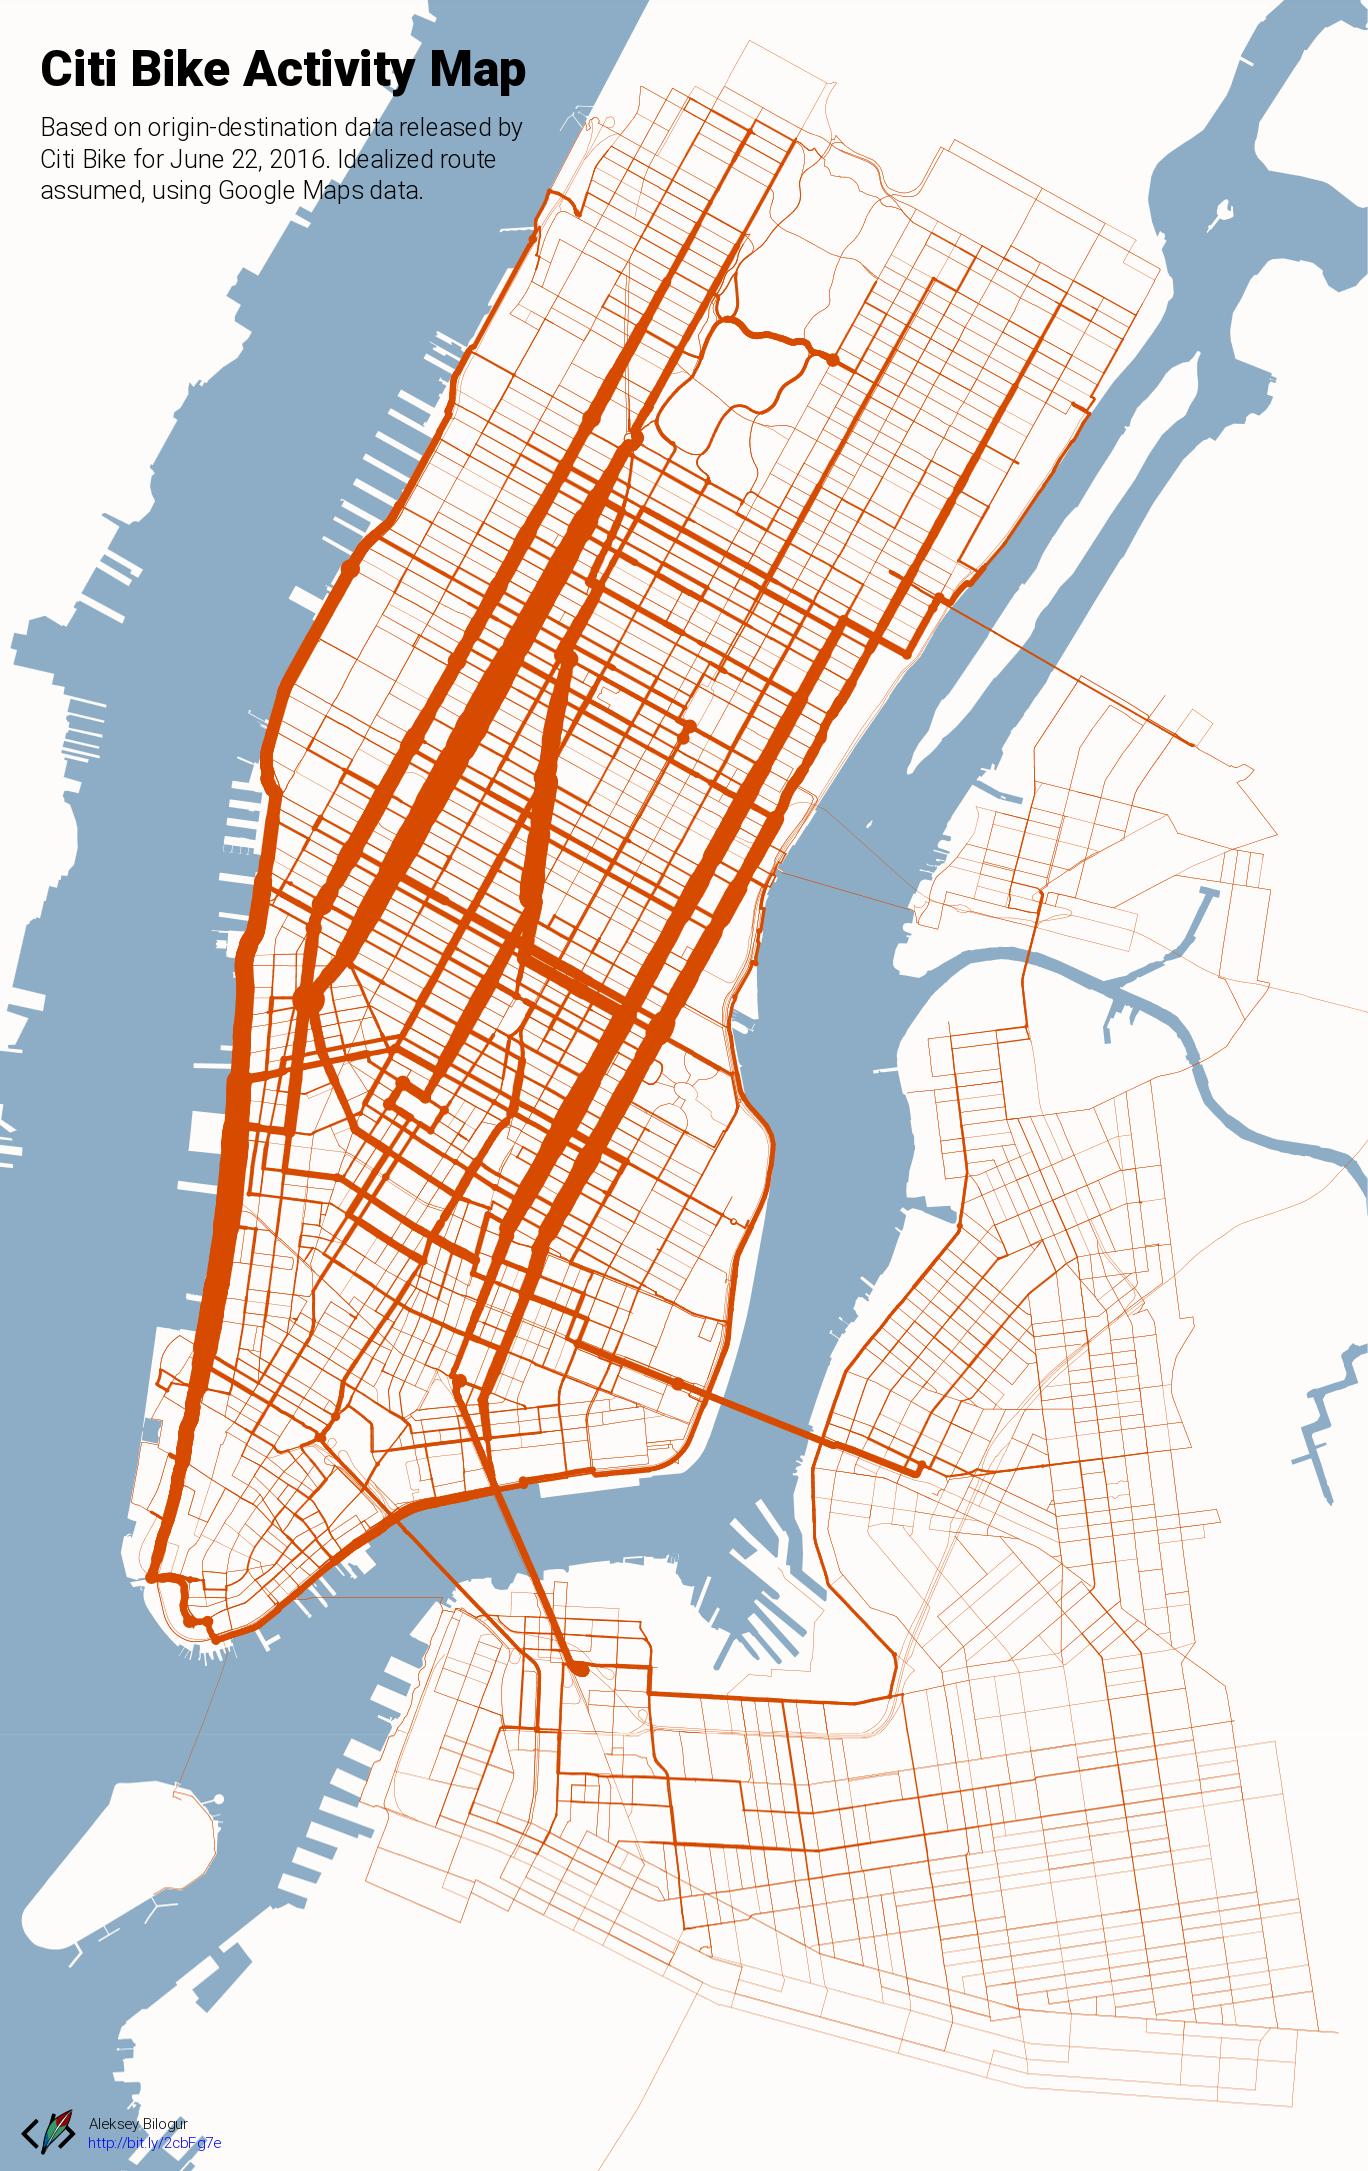 Citi Bike activity map [OC] : nyc Citibank Map on